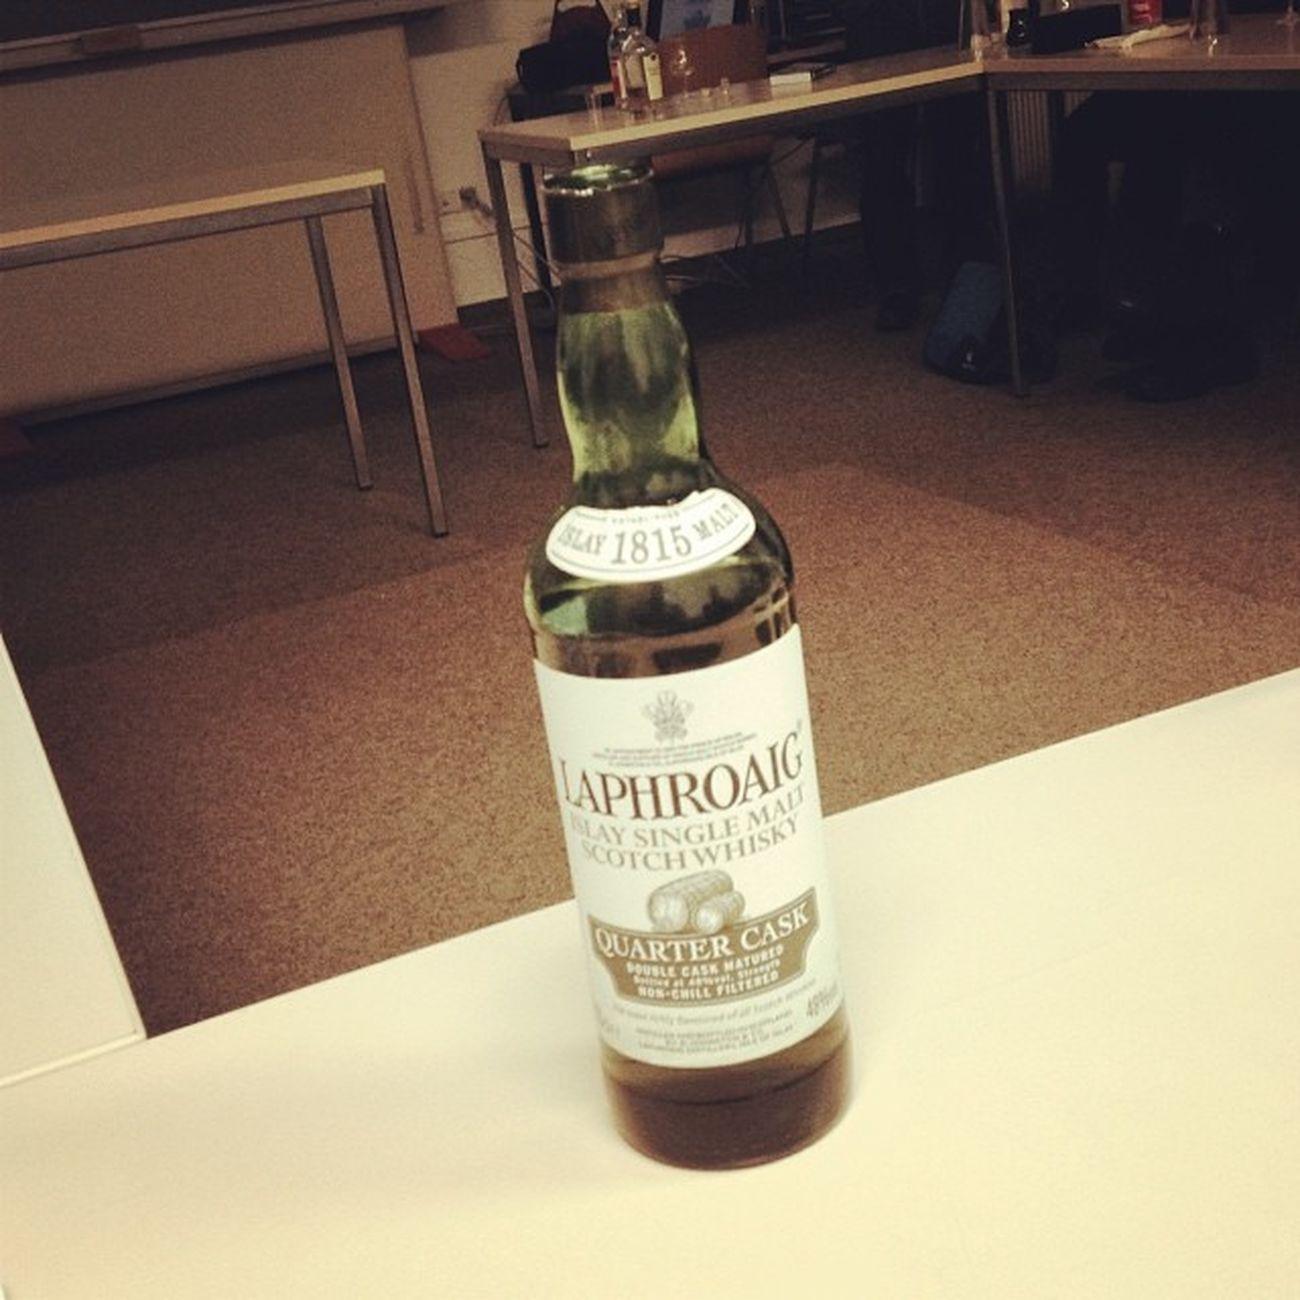 2. Laphroaig Quarter Cask #whiskyVHS Whiskyvhs